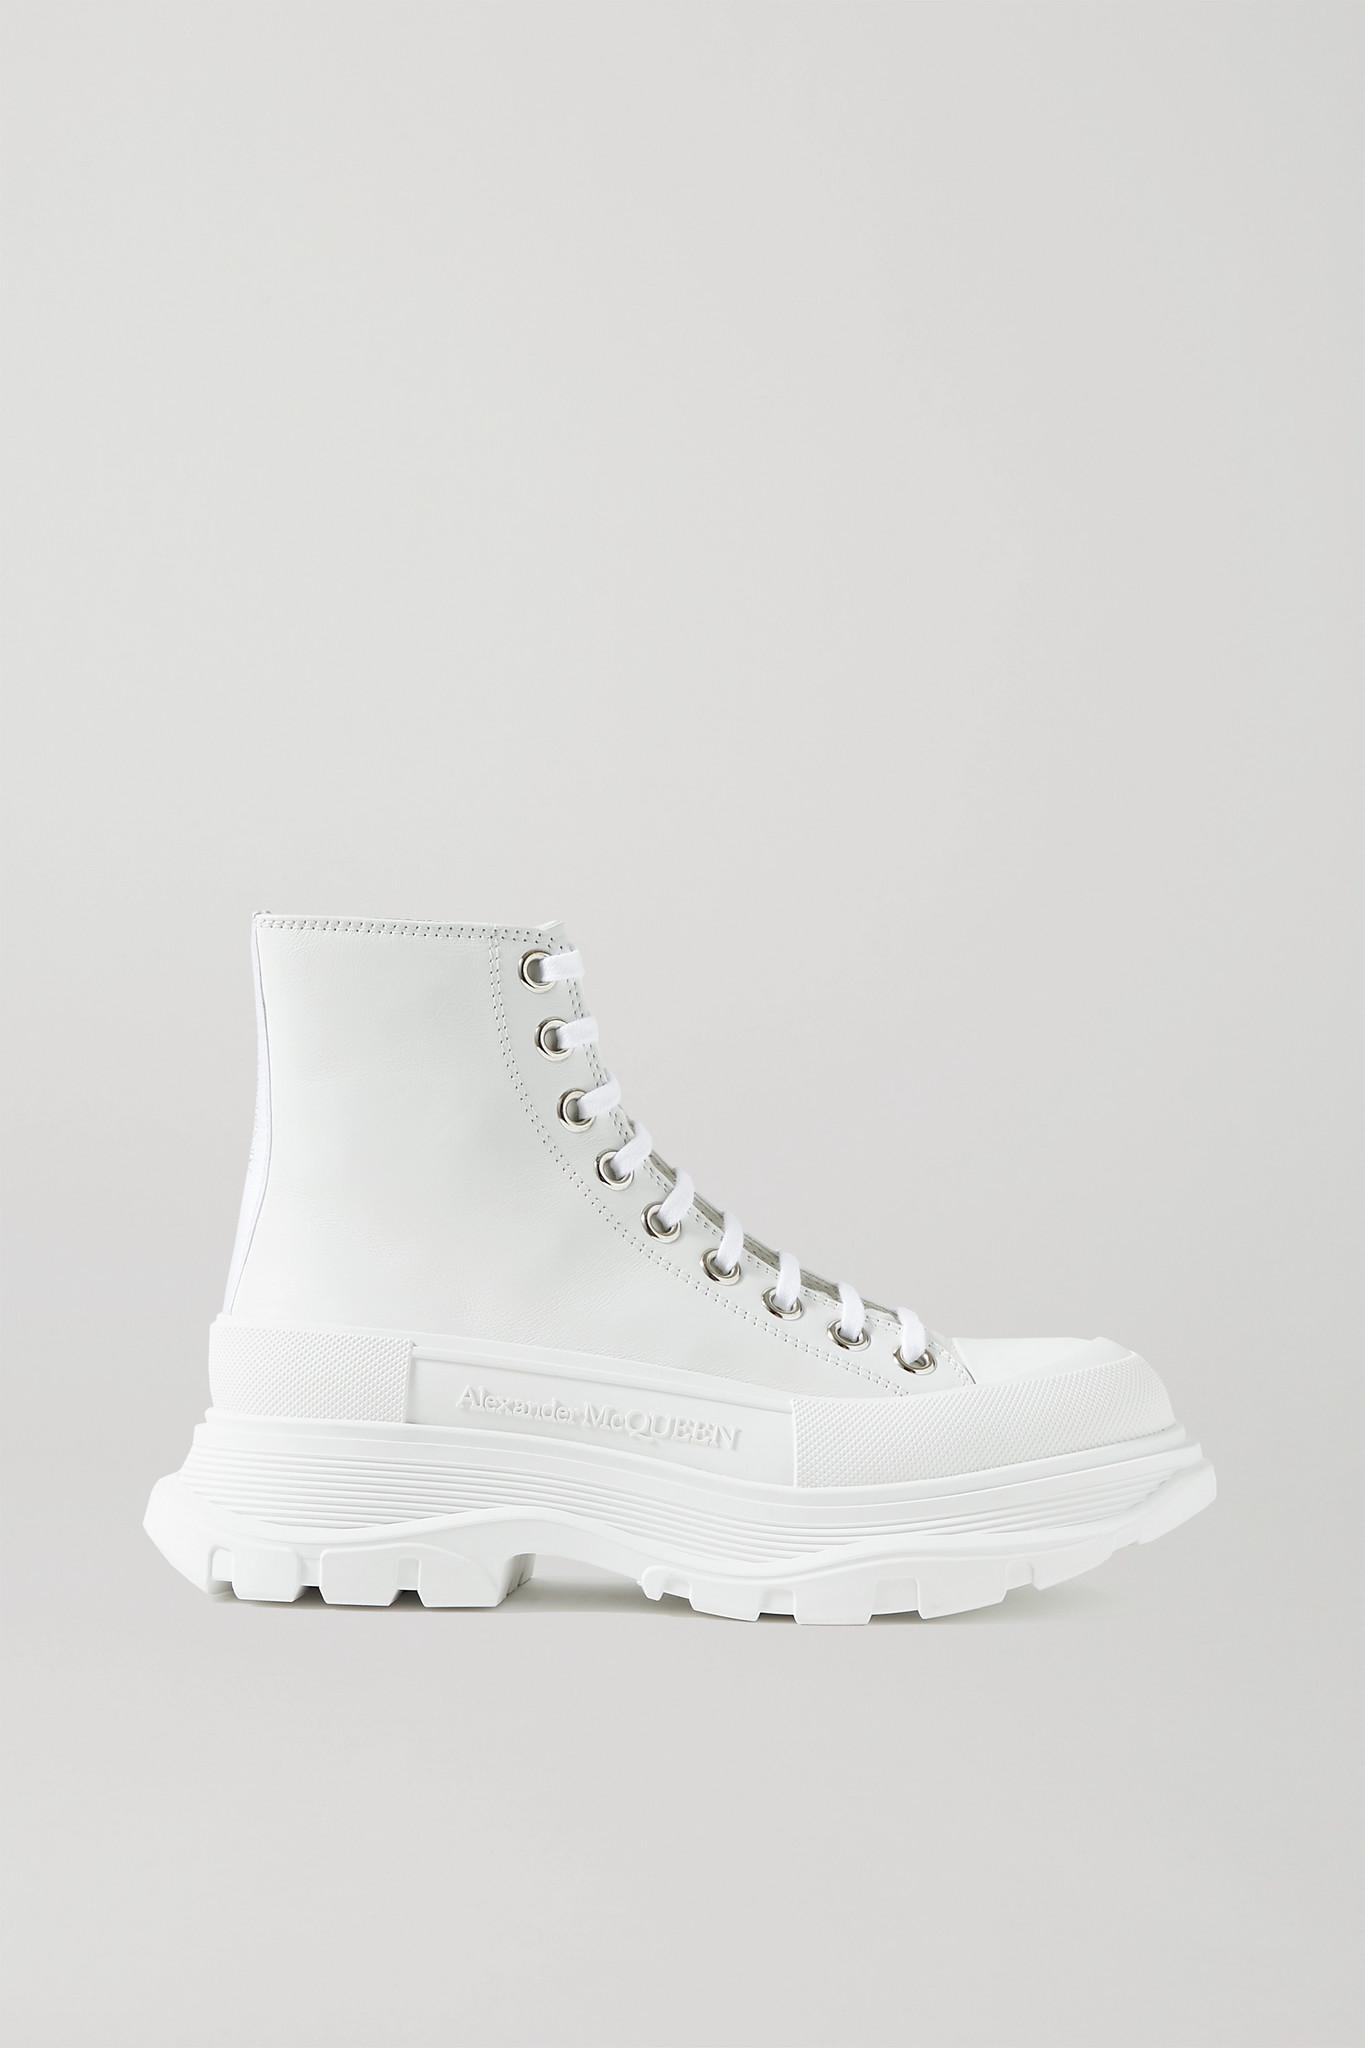 ALEXANDER MCQUEEN - 帆布橡胶厚底踝靴 - 白色 - IT40